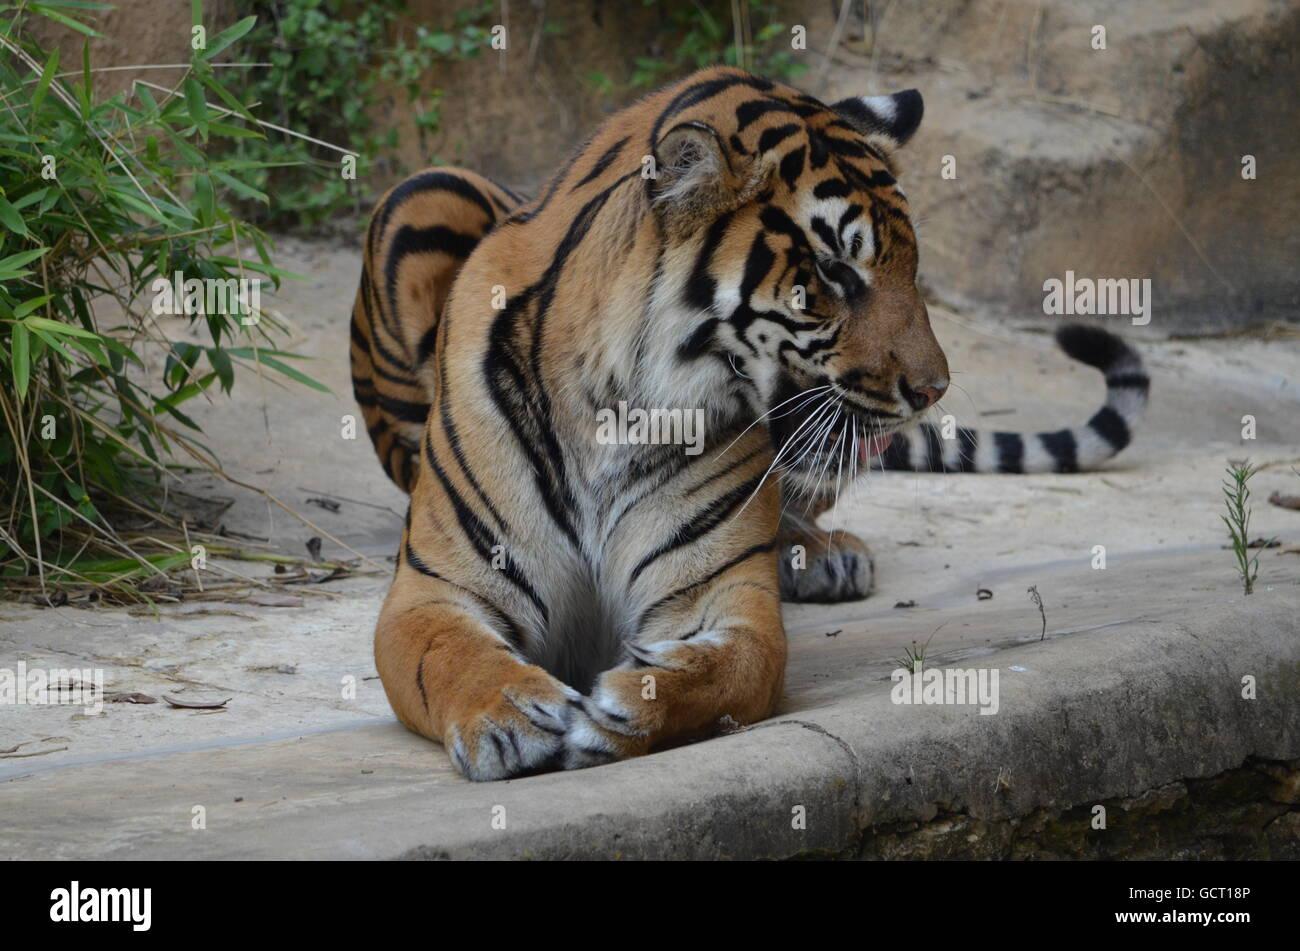 Sumatran Tiger Peering Over Ledge and Growling San Antonio Zoo San Antonio Texas USA - Stock Image